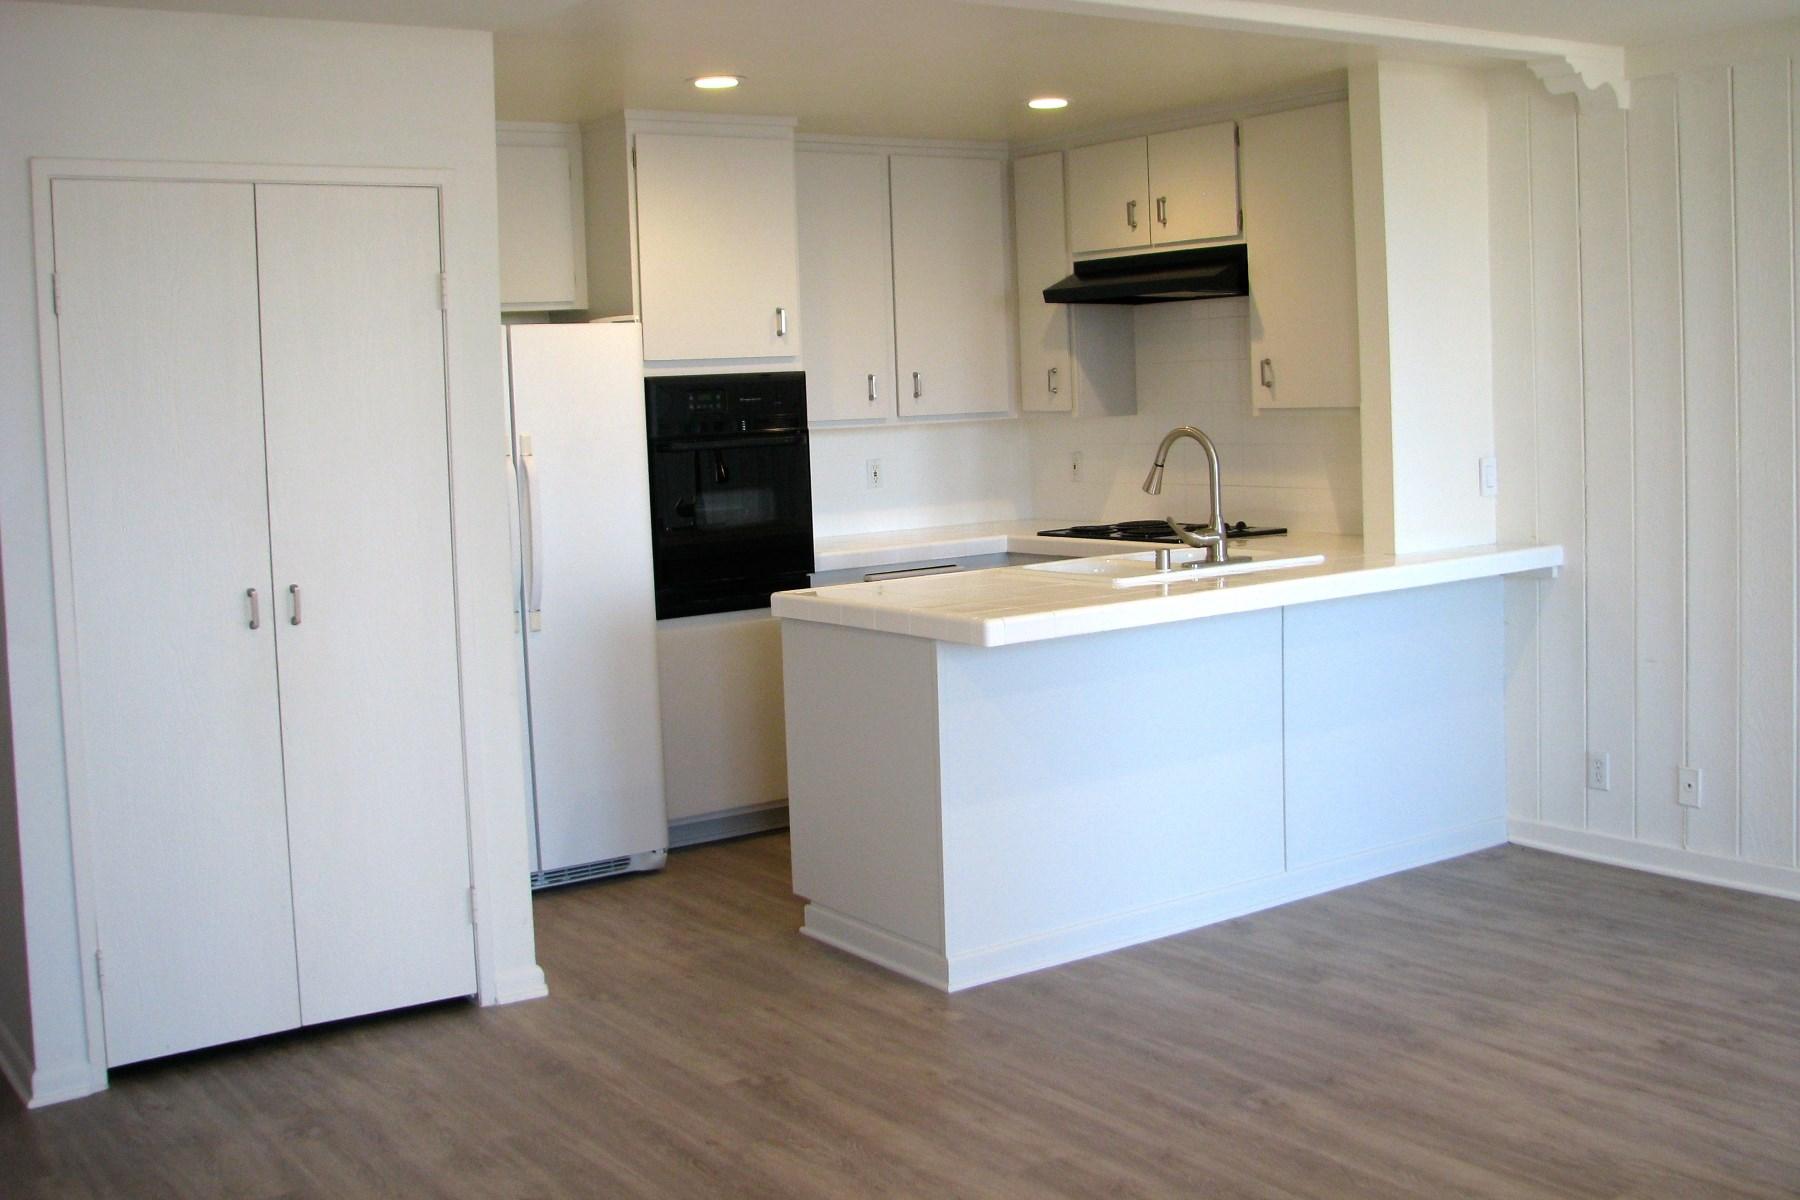 Condominium for Sale at Oceanside Malibu Only $489,000! 11916 Whalers Lane Malibu, California 90265 United States